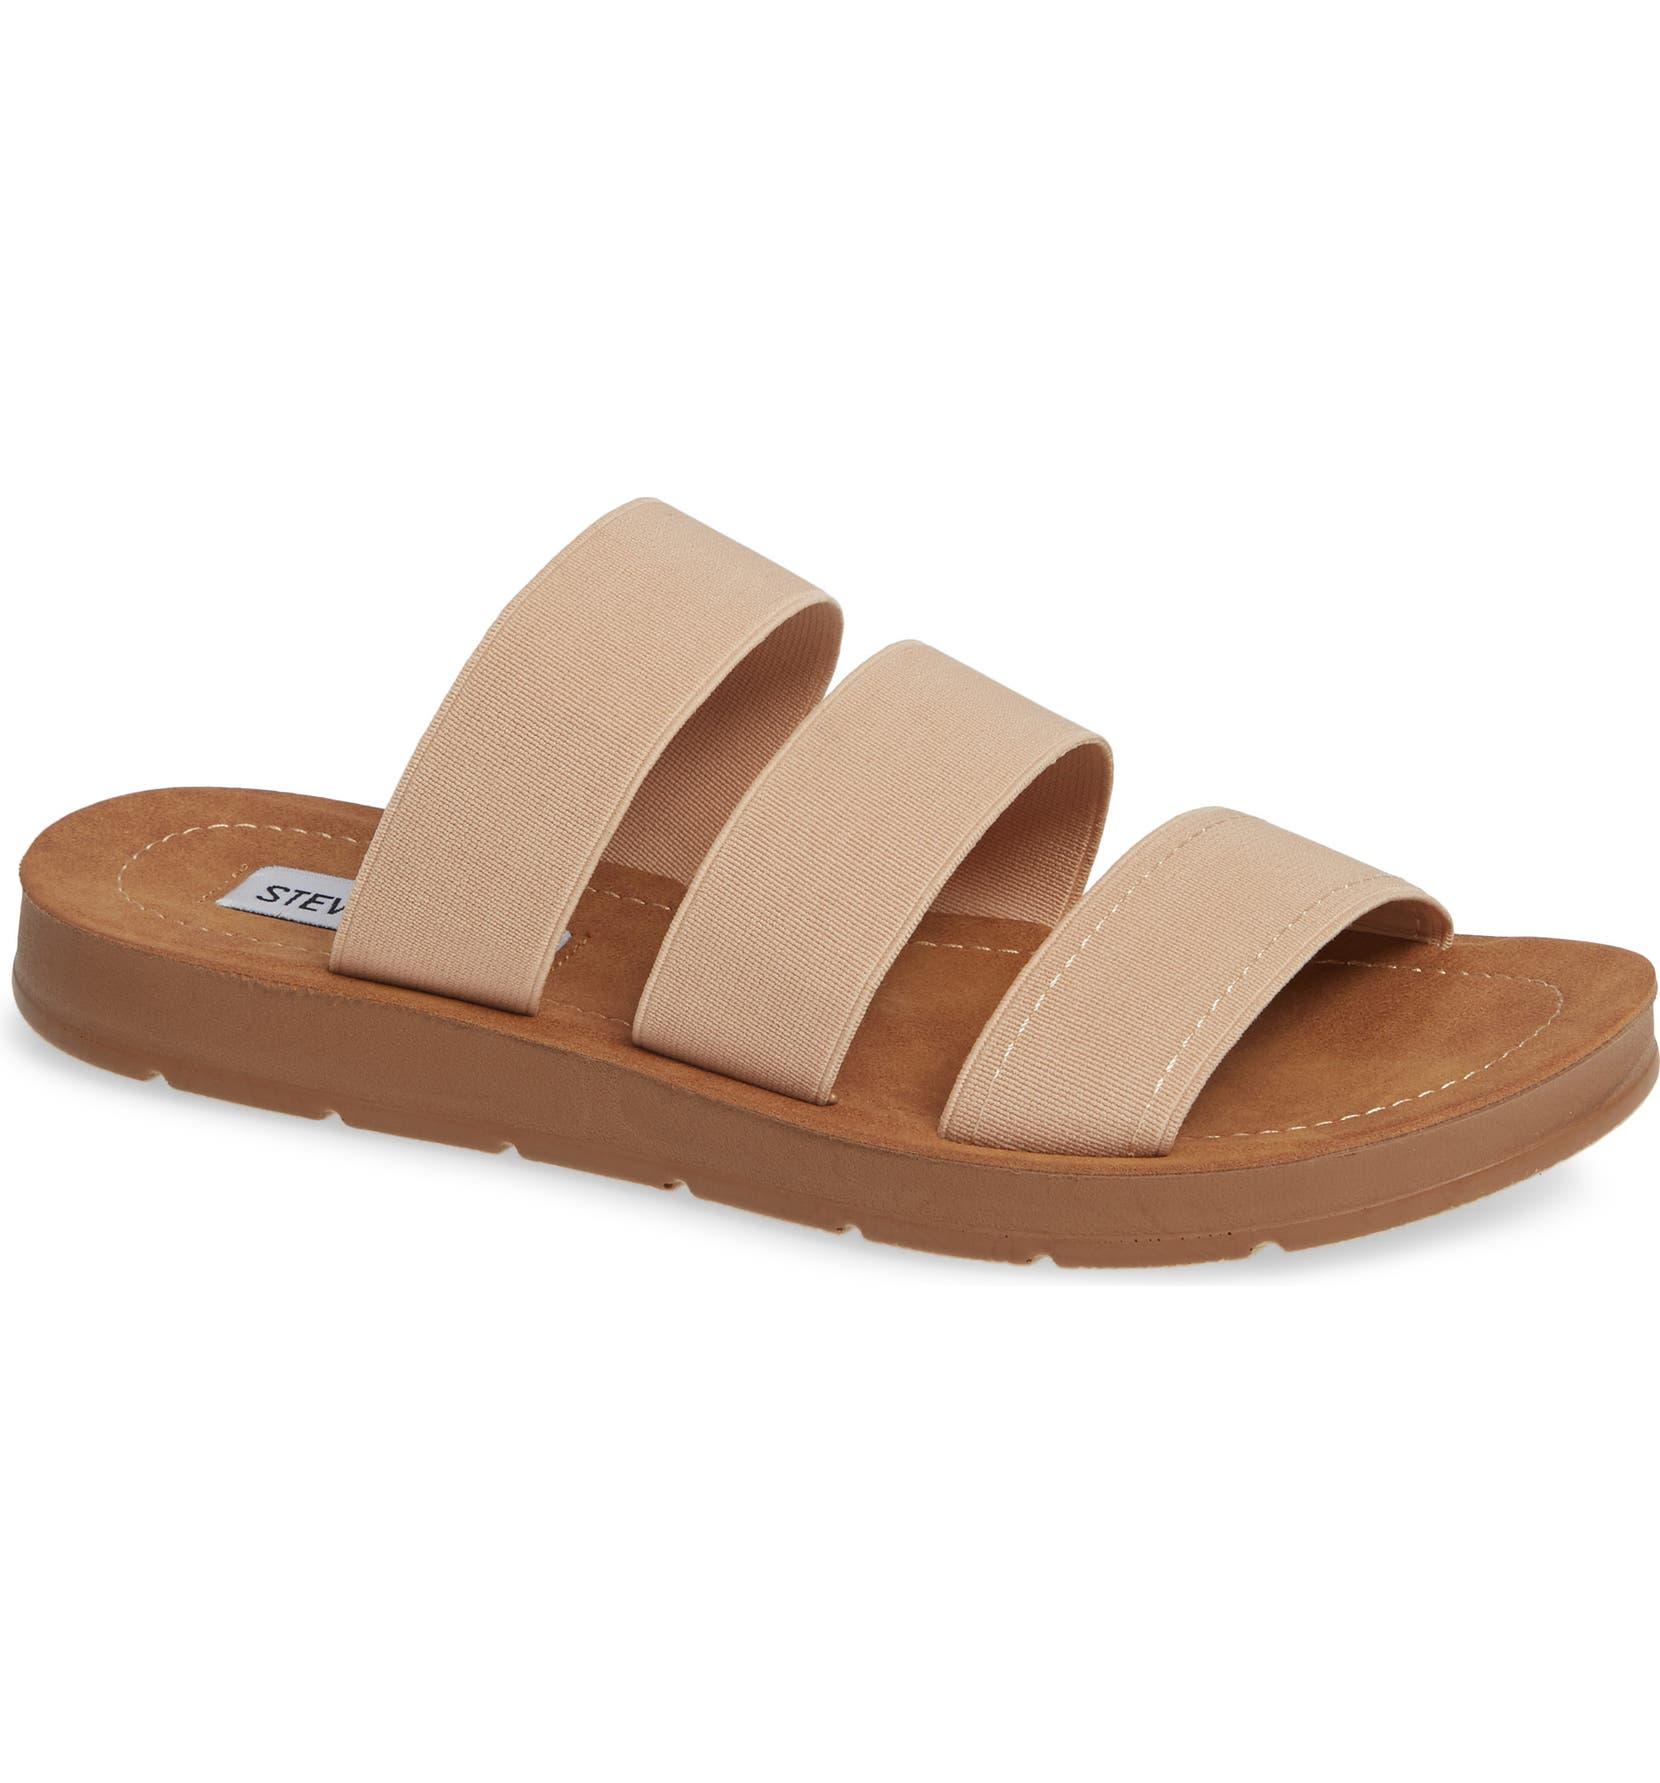 7a9a5466f2 Steve Madden Pascale Slide Sandal (Women) | Nordstrom